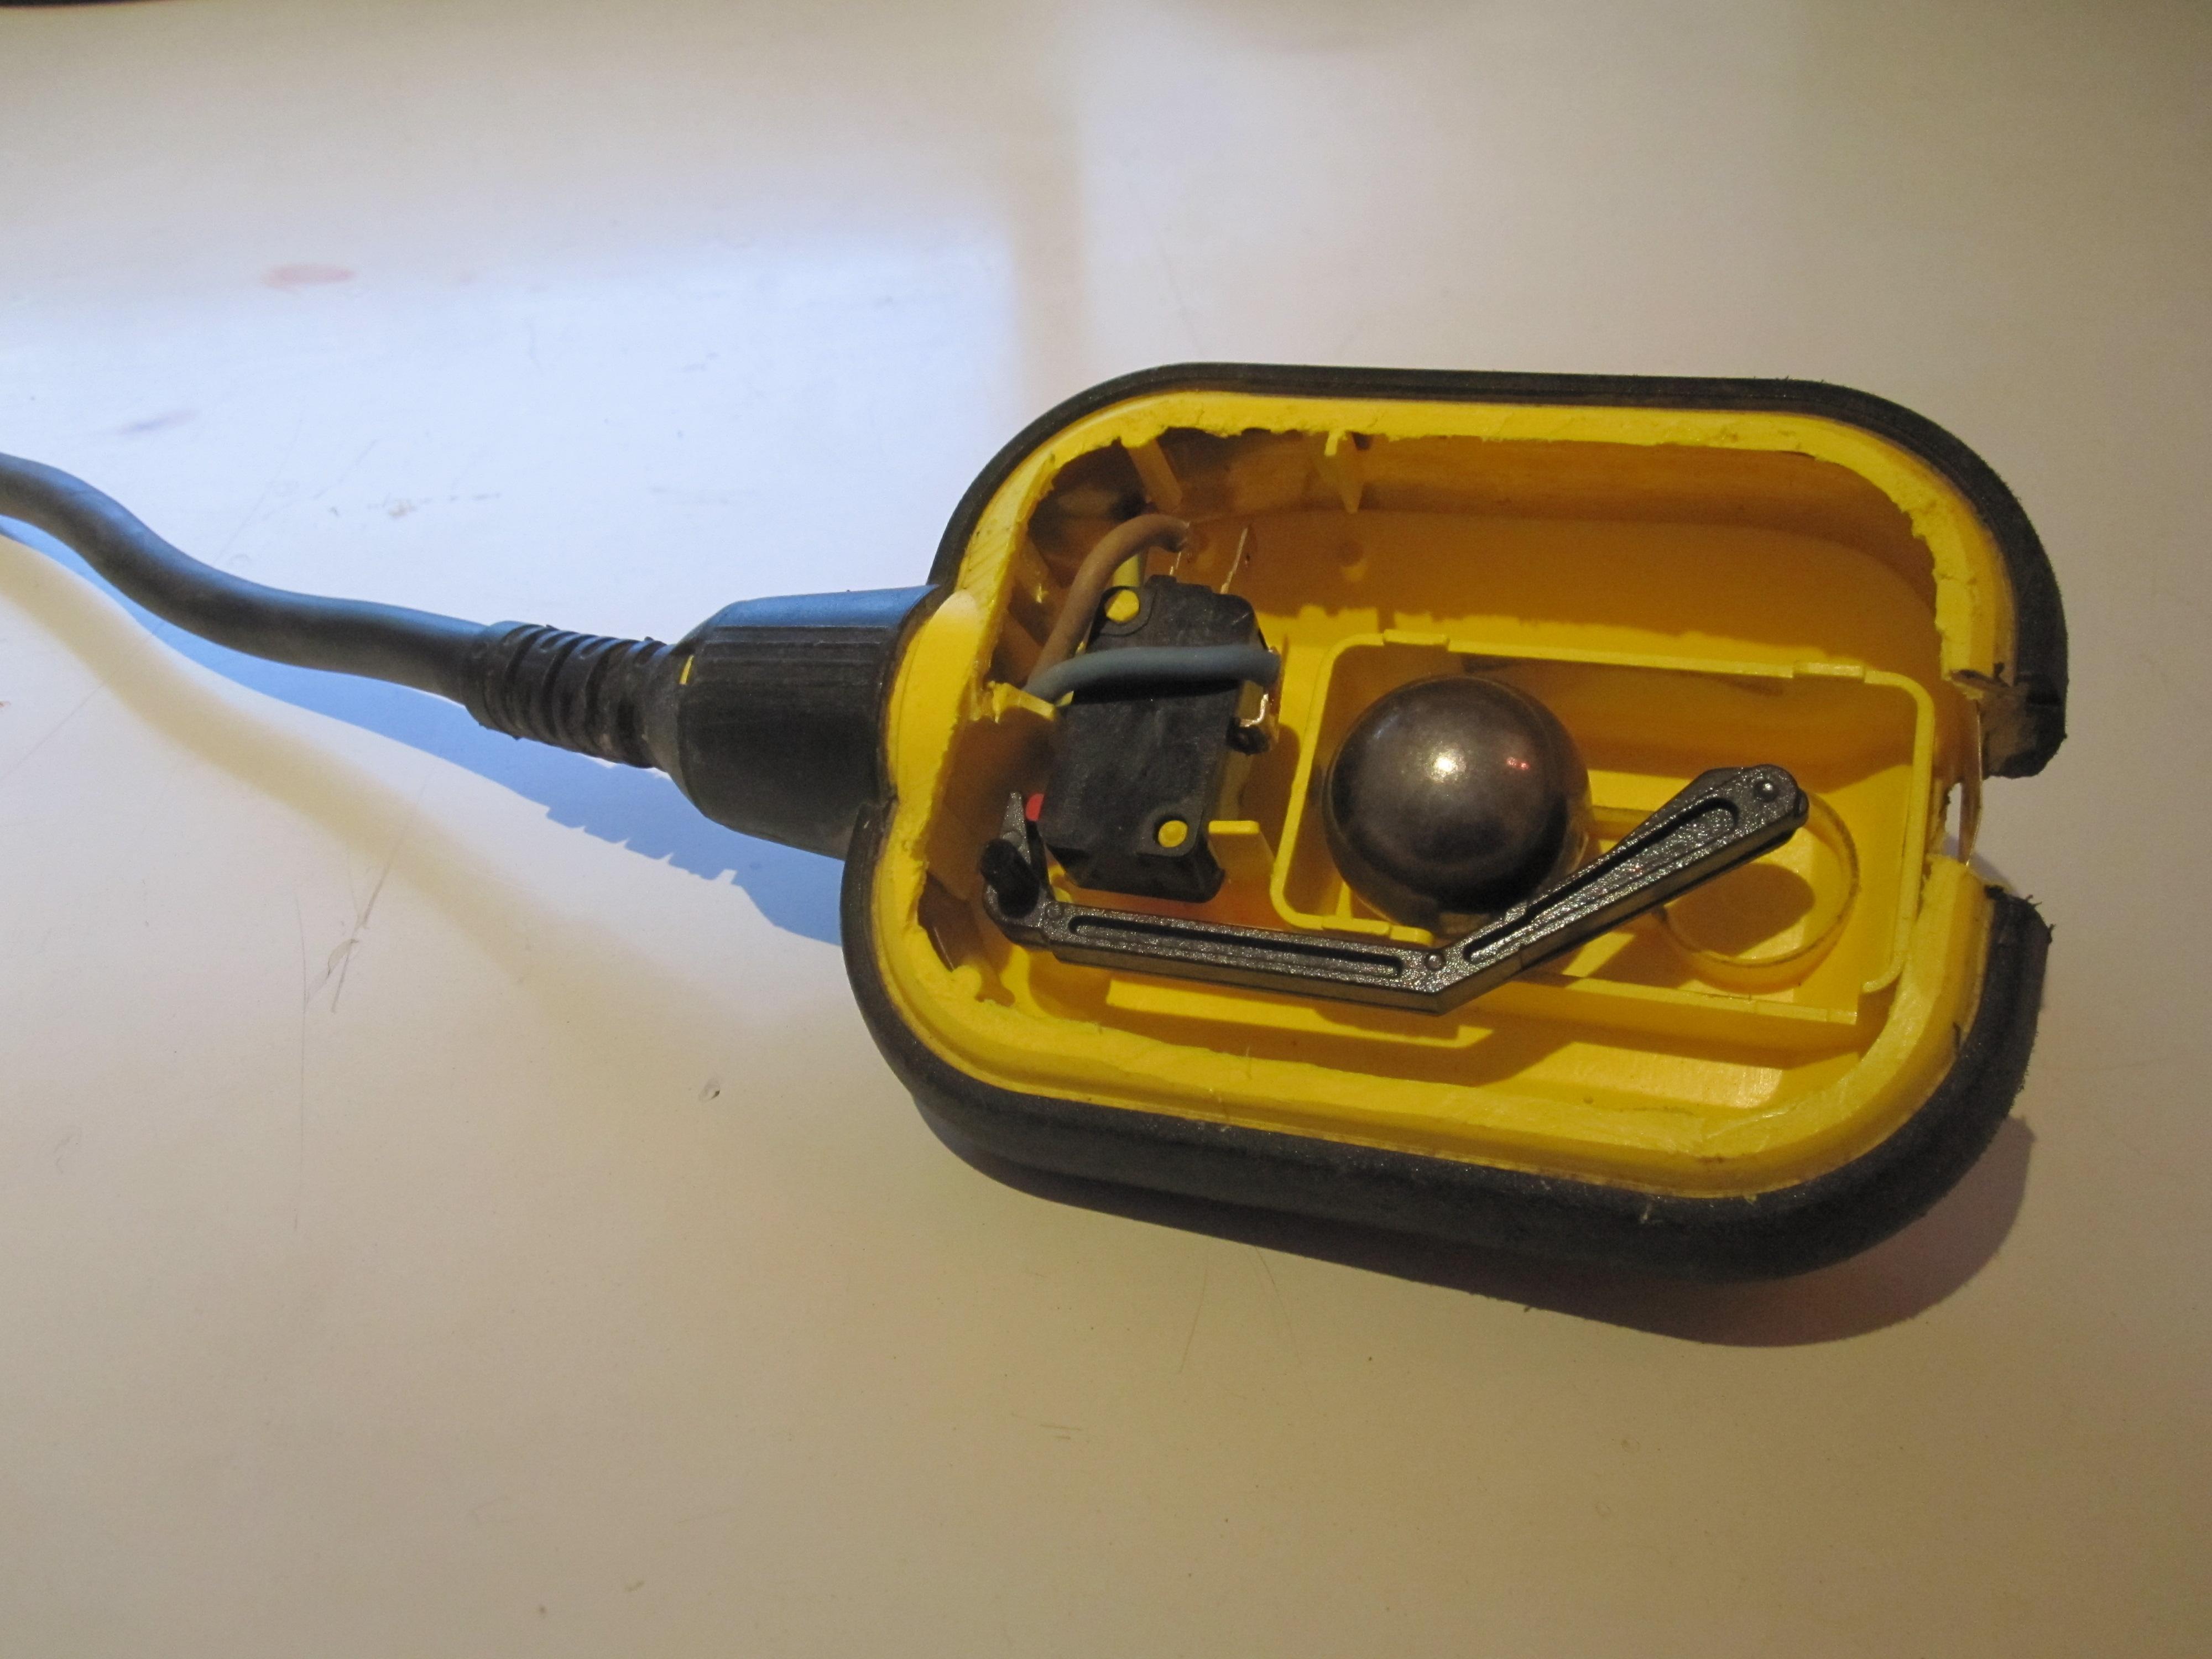 230 volt submersible pump wiring diagram roper dryer plug single phase get free